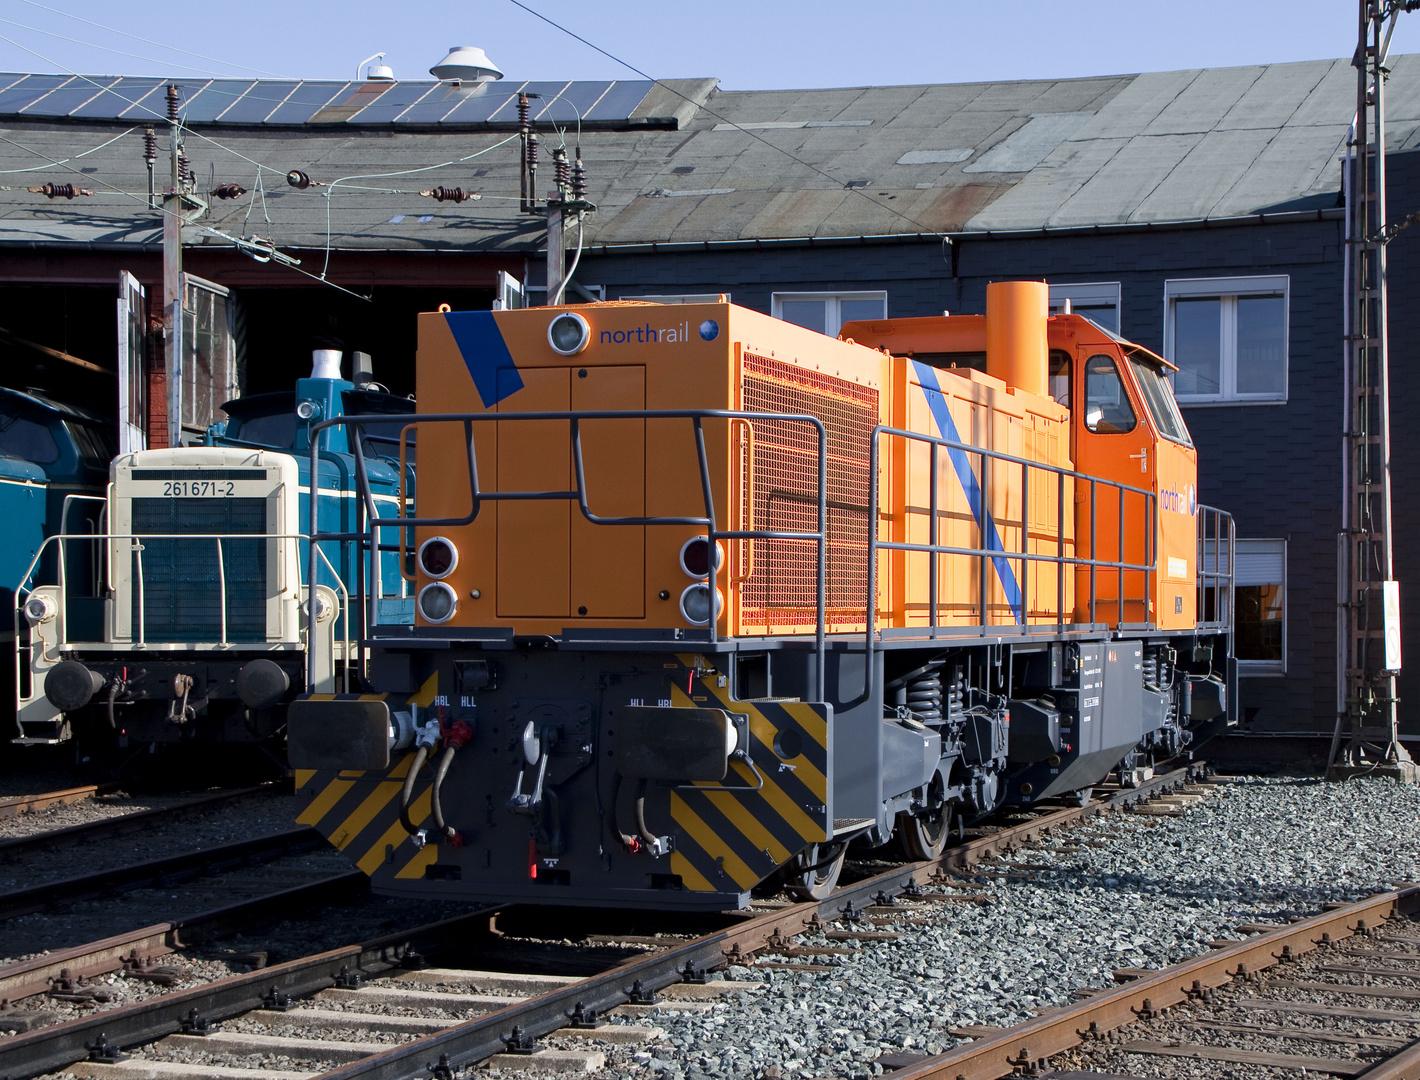 North Rail